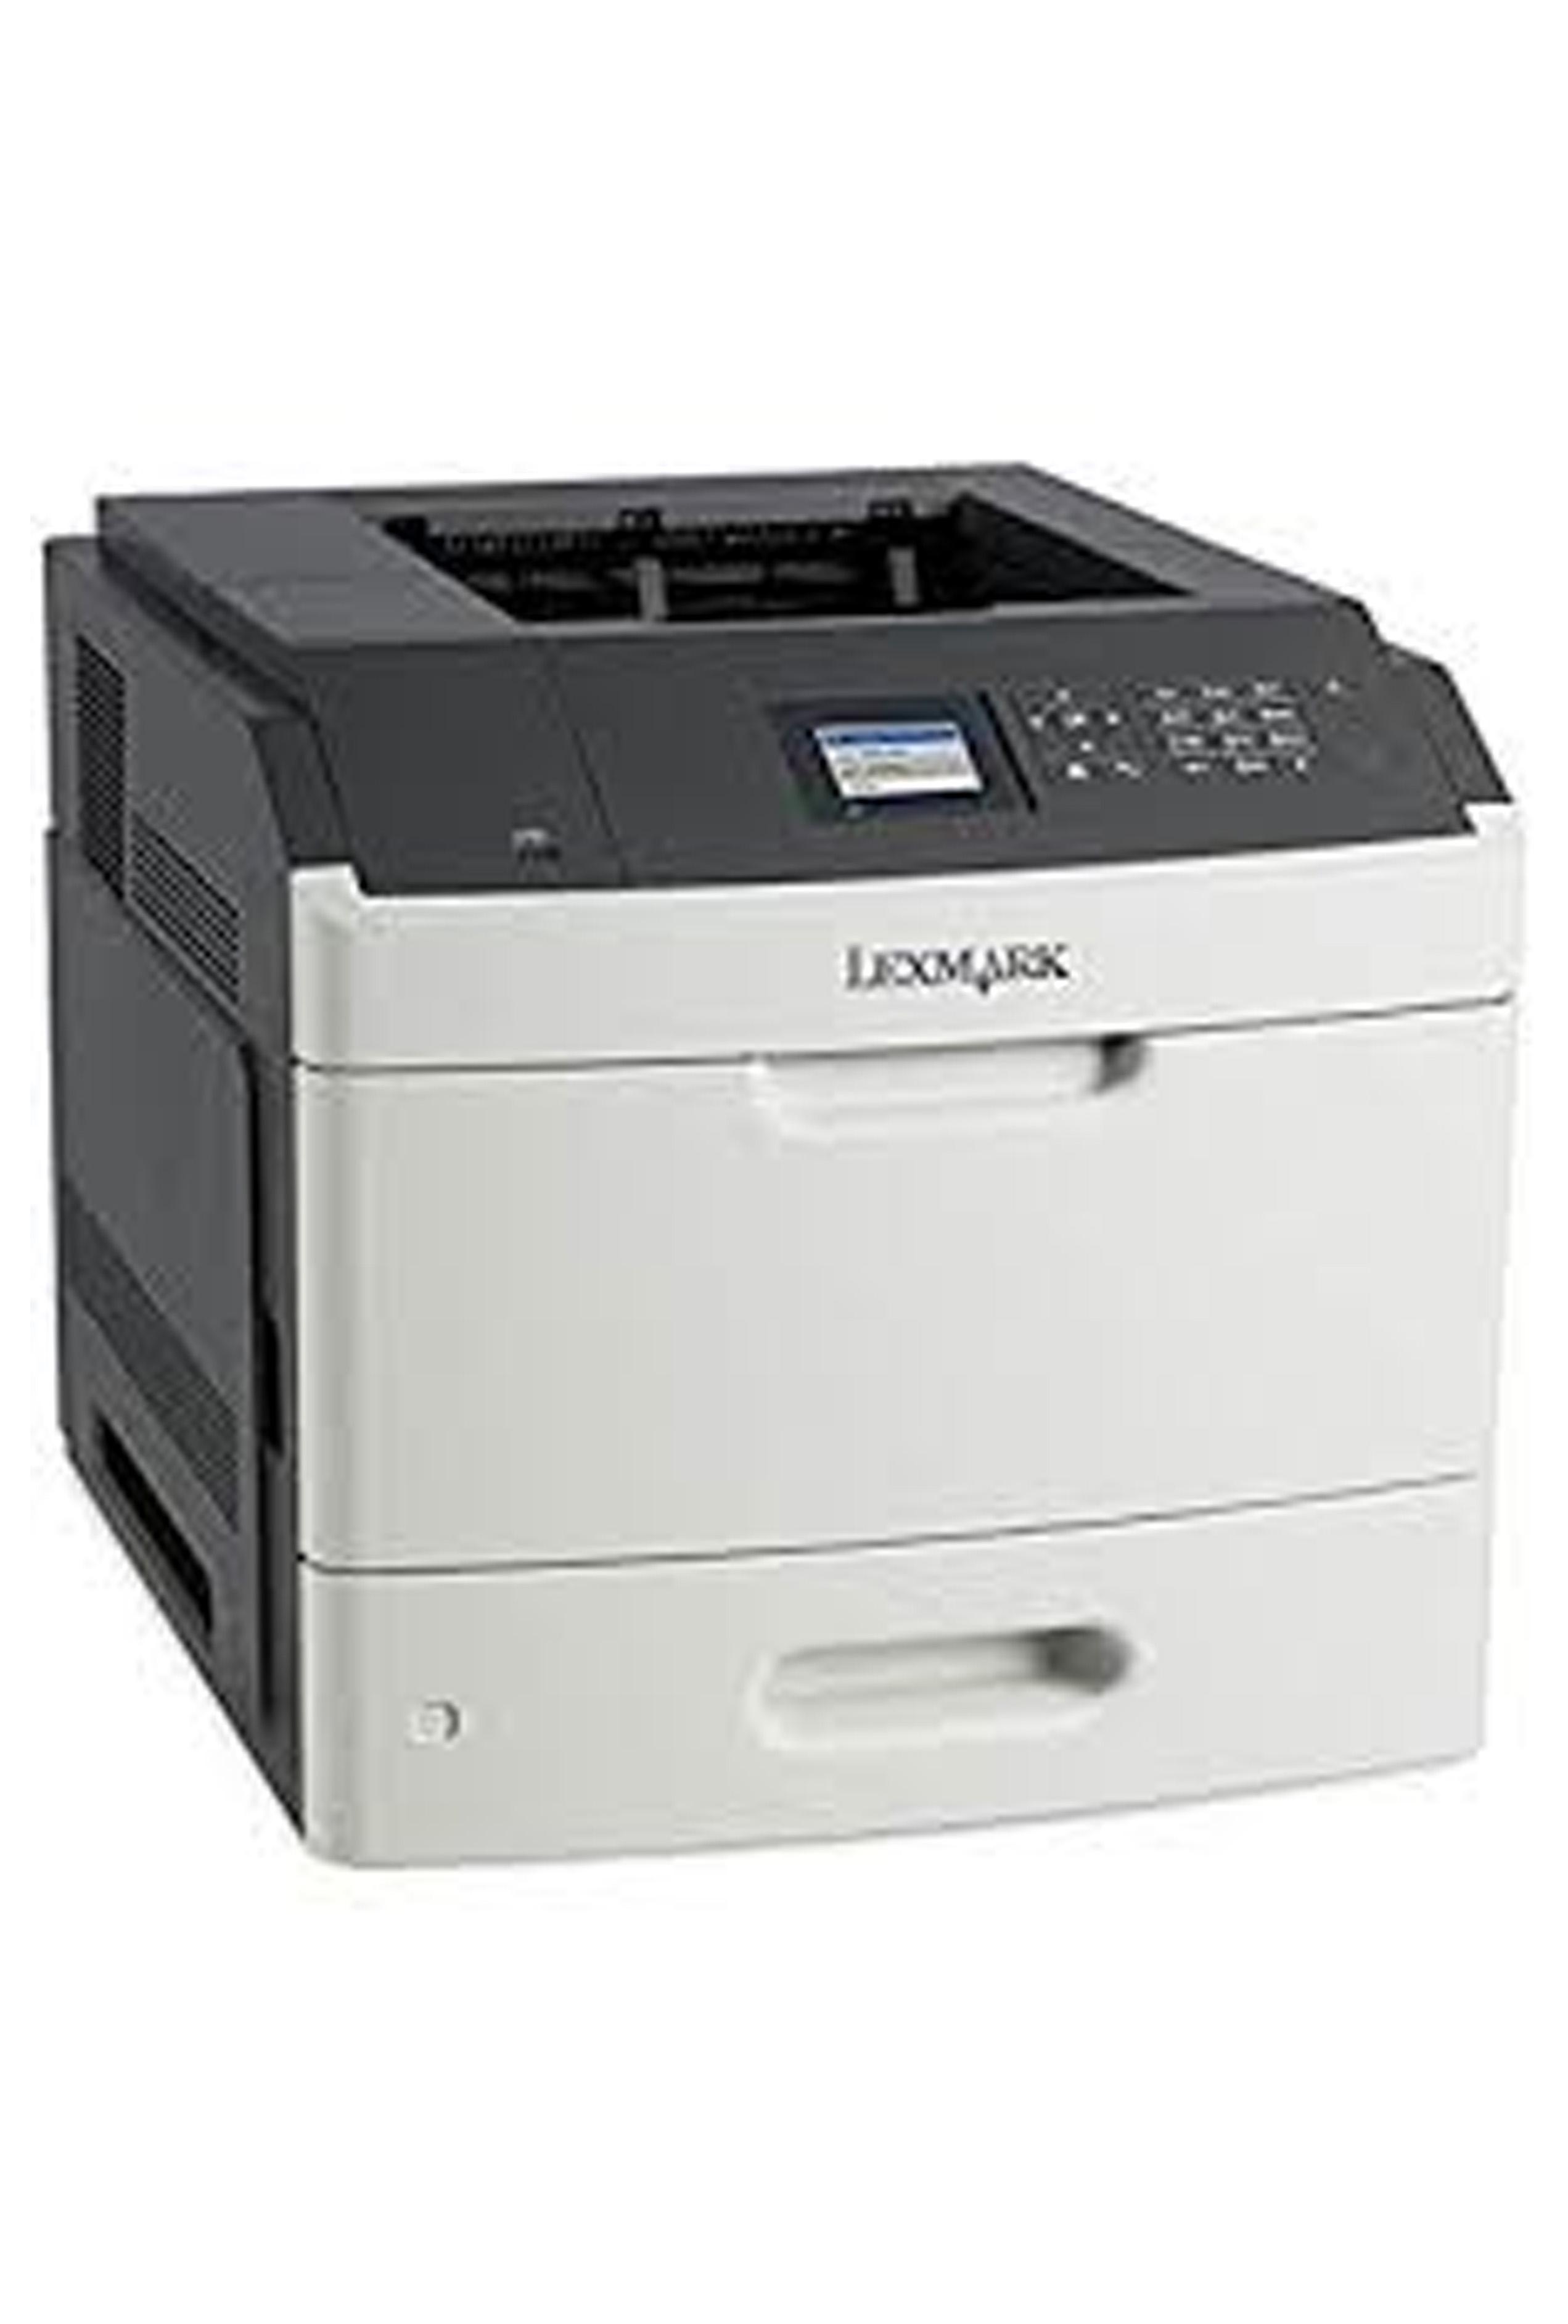 Lexmark MS810DN Laser Printer...